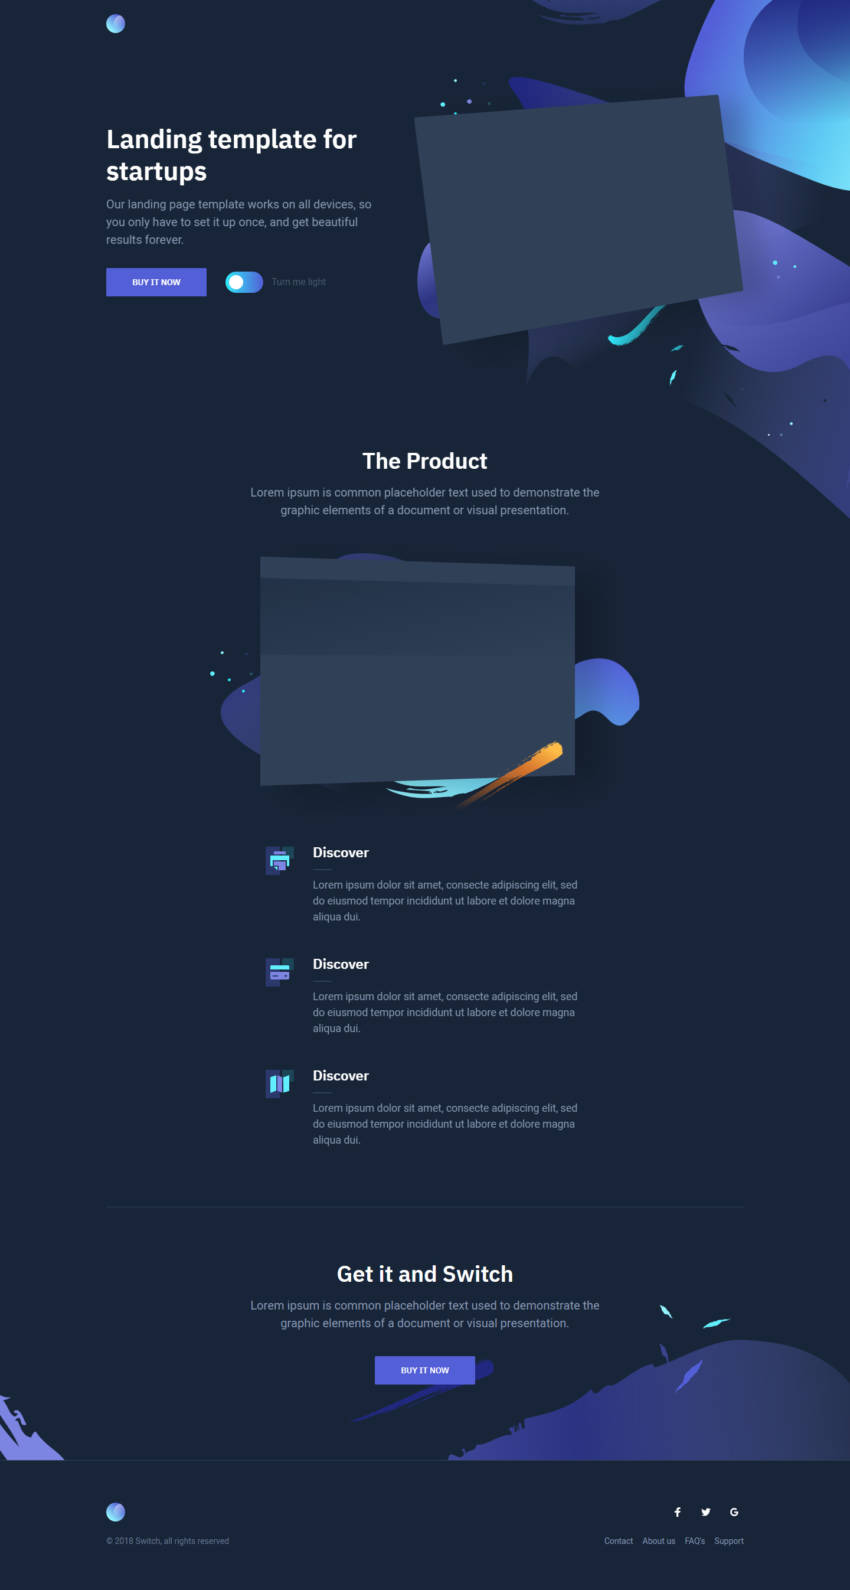 Switch Day & Night template (HTML5/CSS3) скачать бесплатно